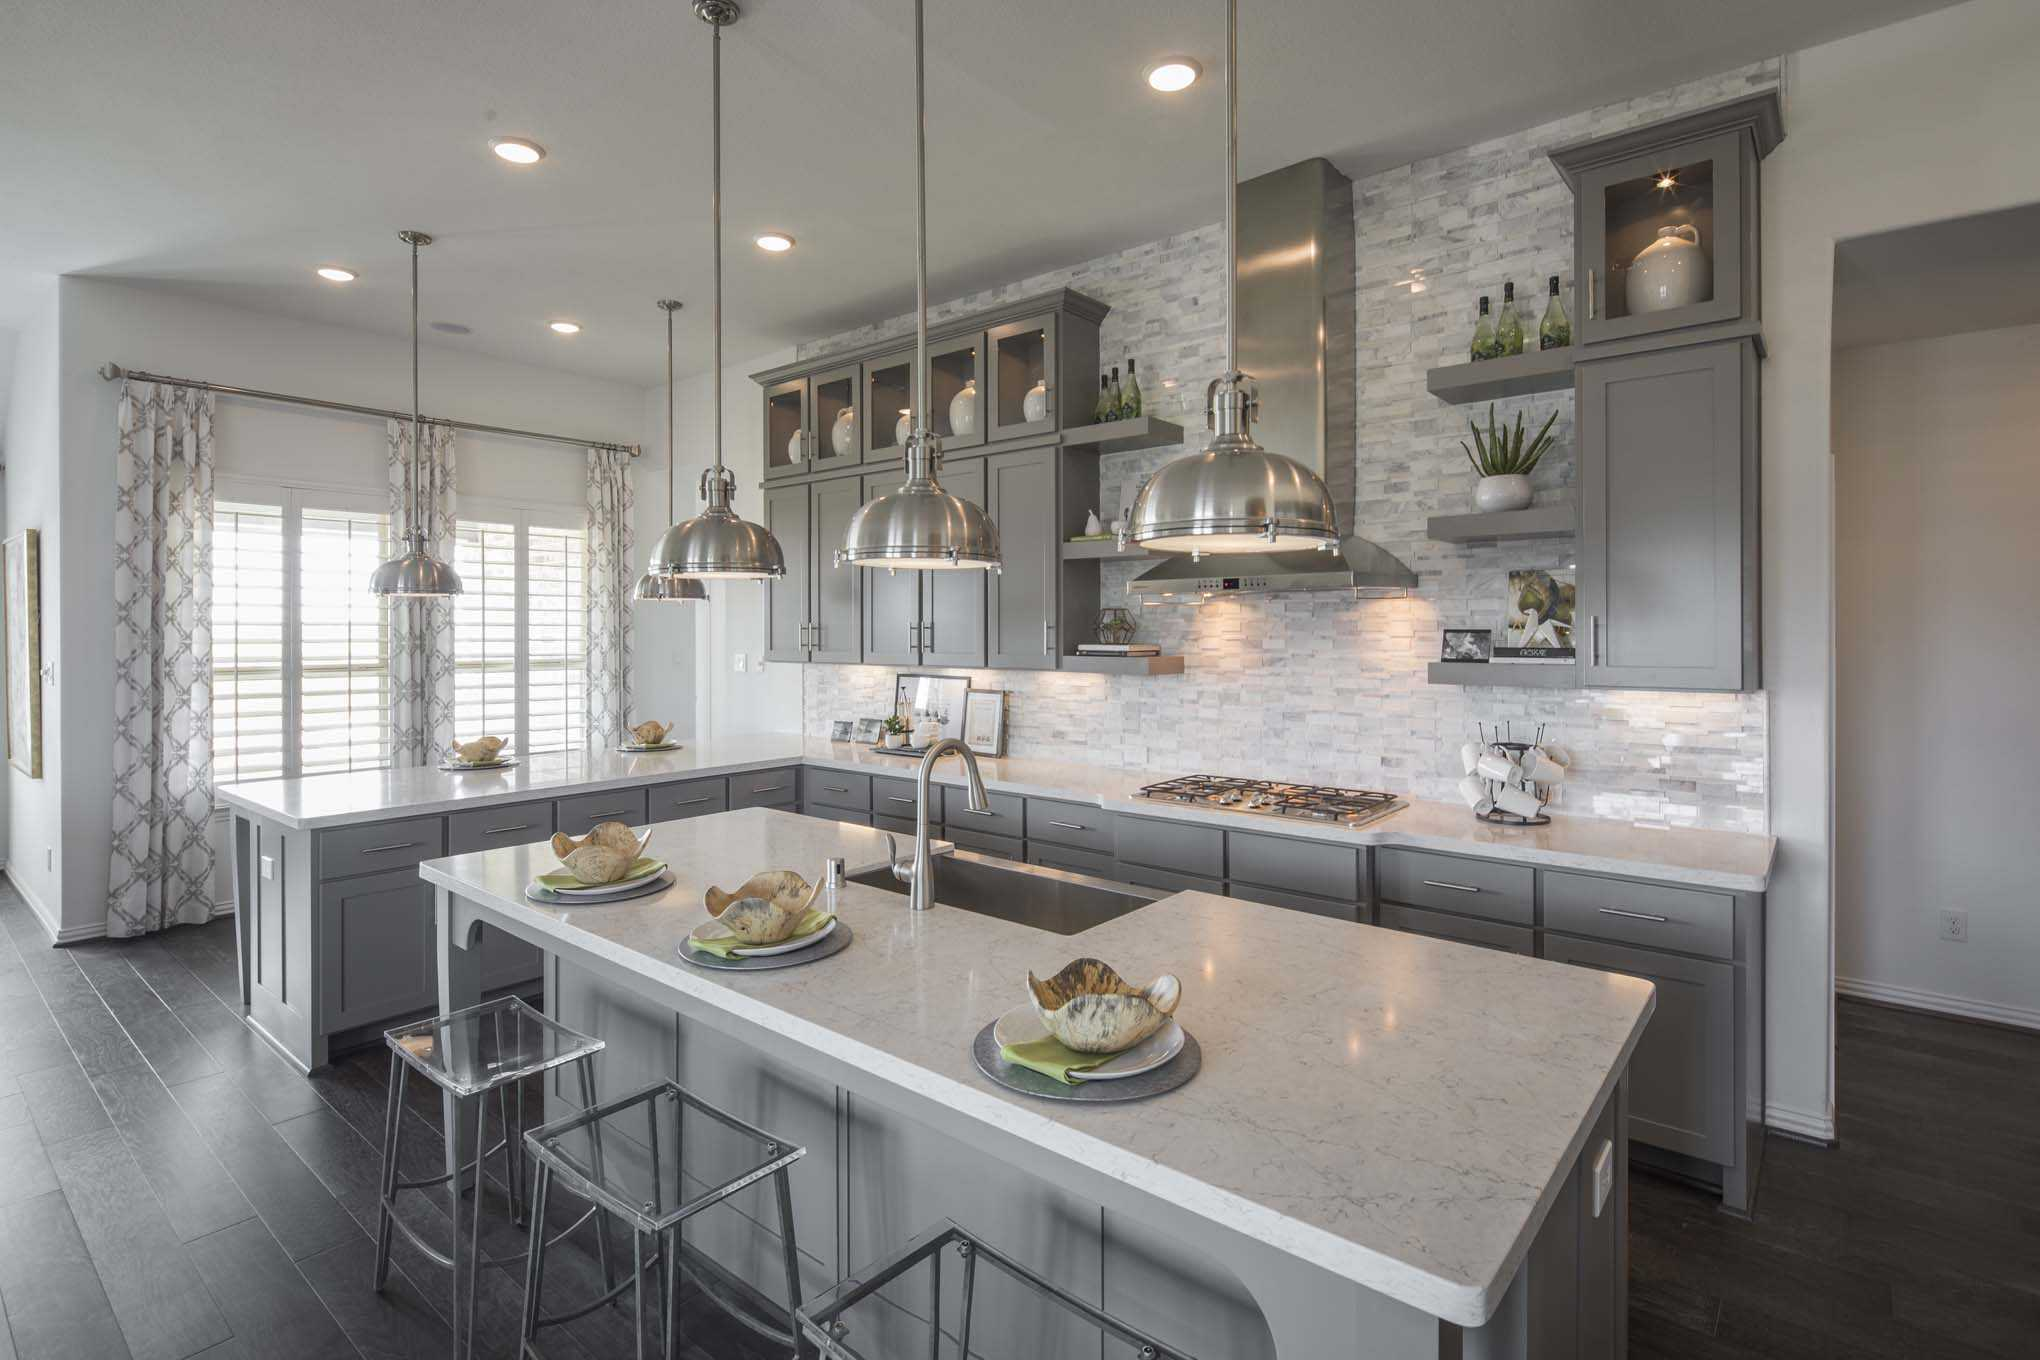 Single Family for Sale at Plan 200 3521 Washington Drive Melissa, Texas 75454 United States